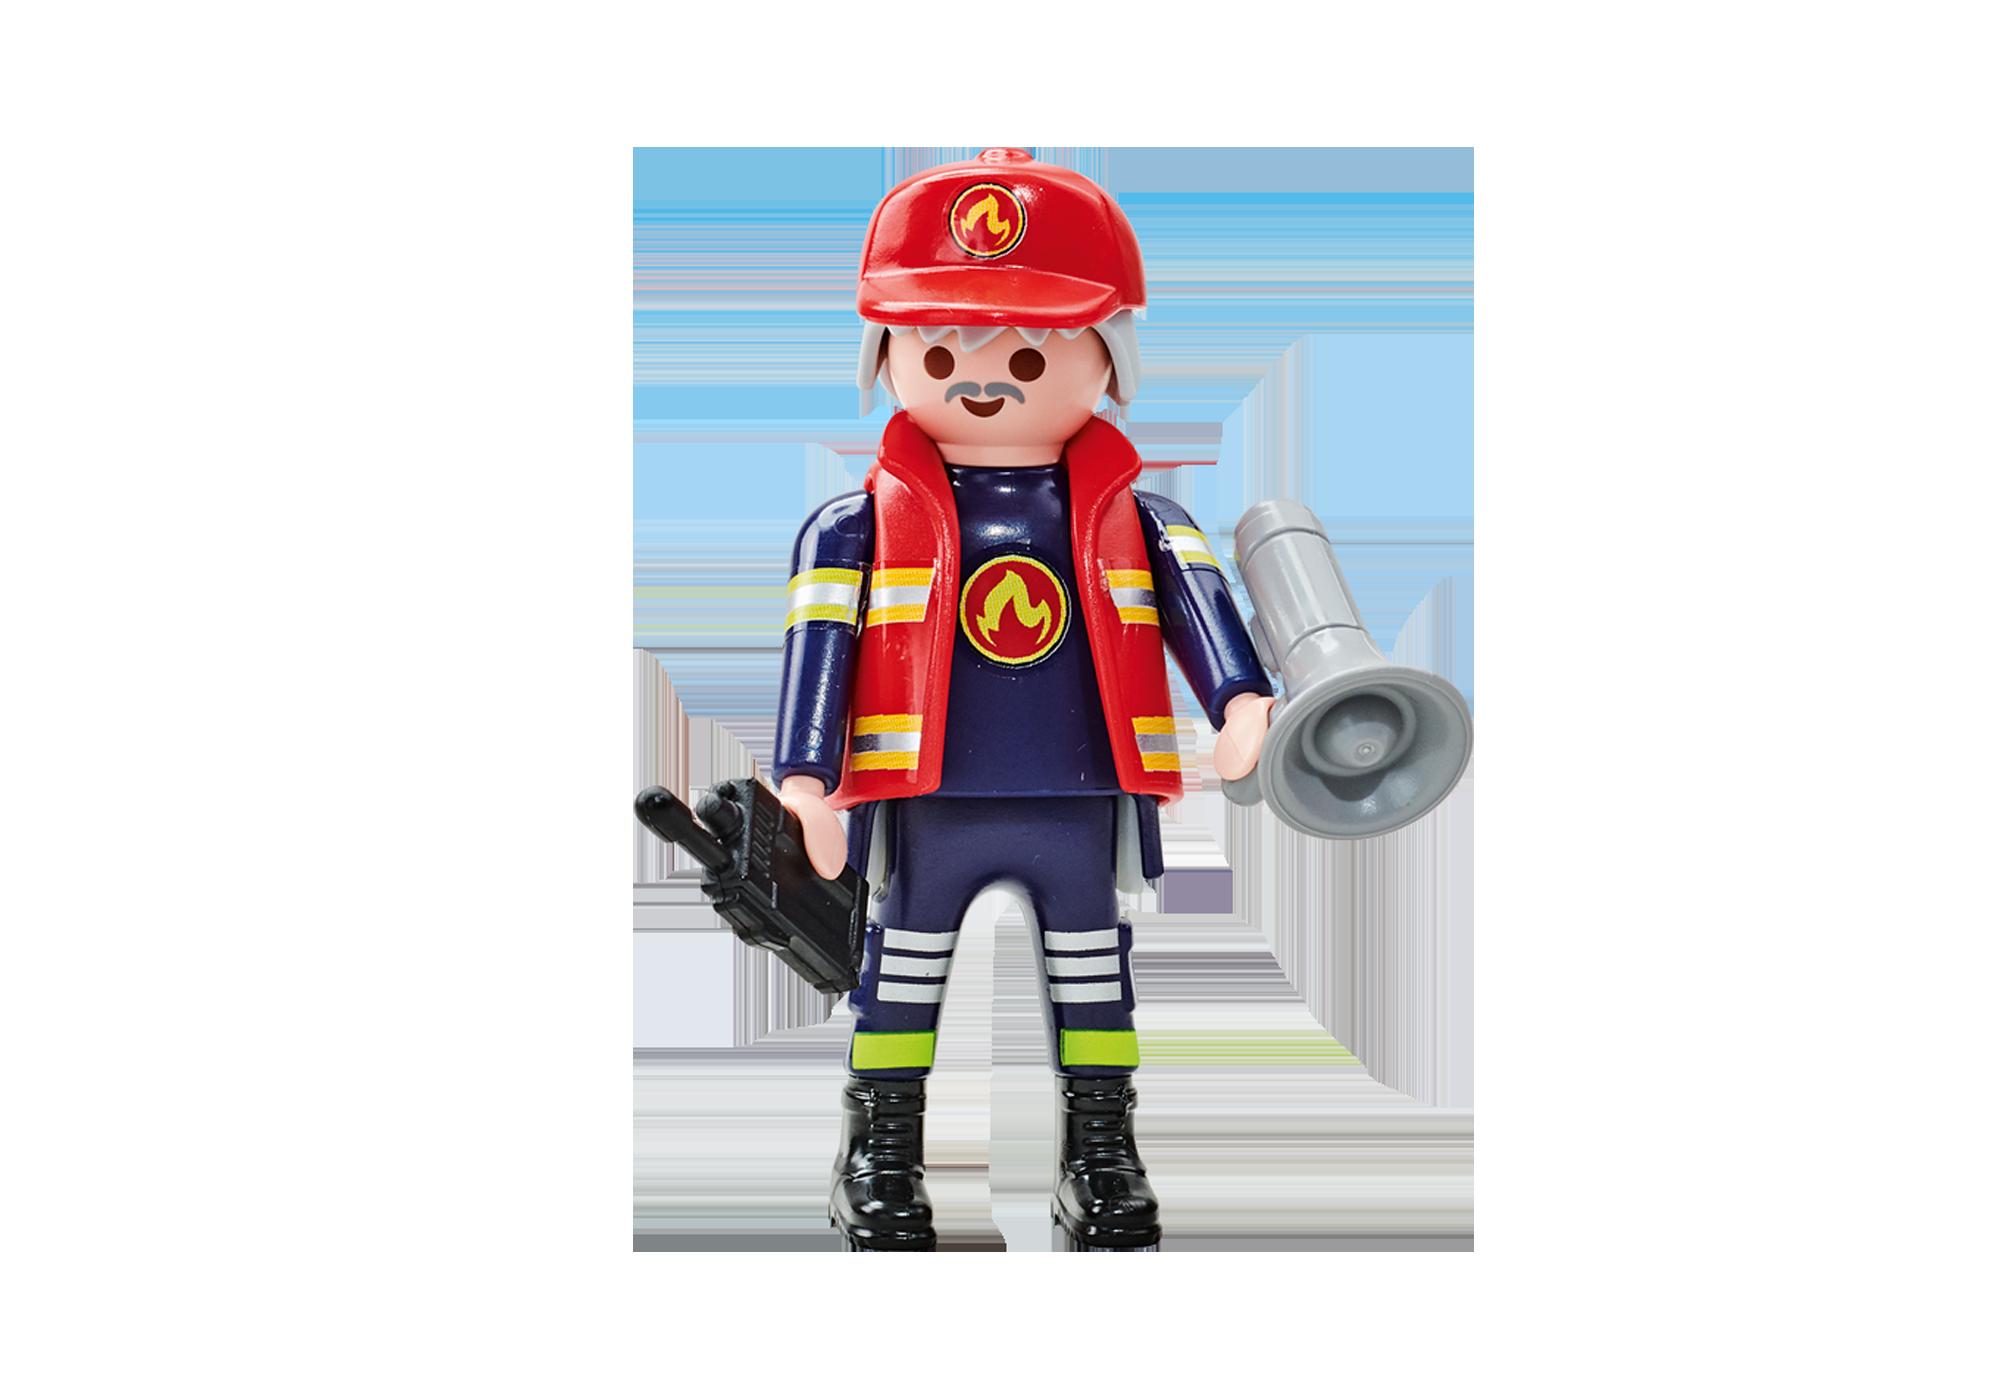 http://media.playmobil.com/i/playmobil/6585_product_detail/Brandweercommandant ploeg B